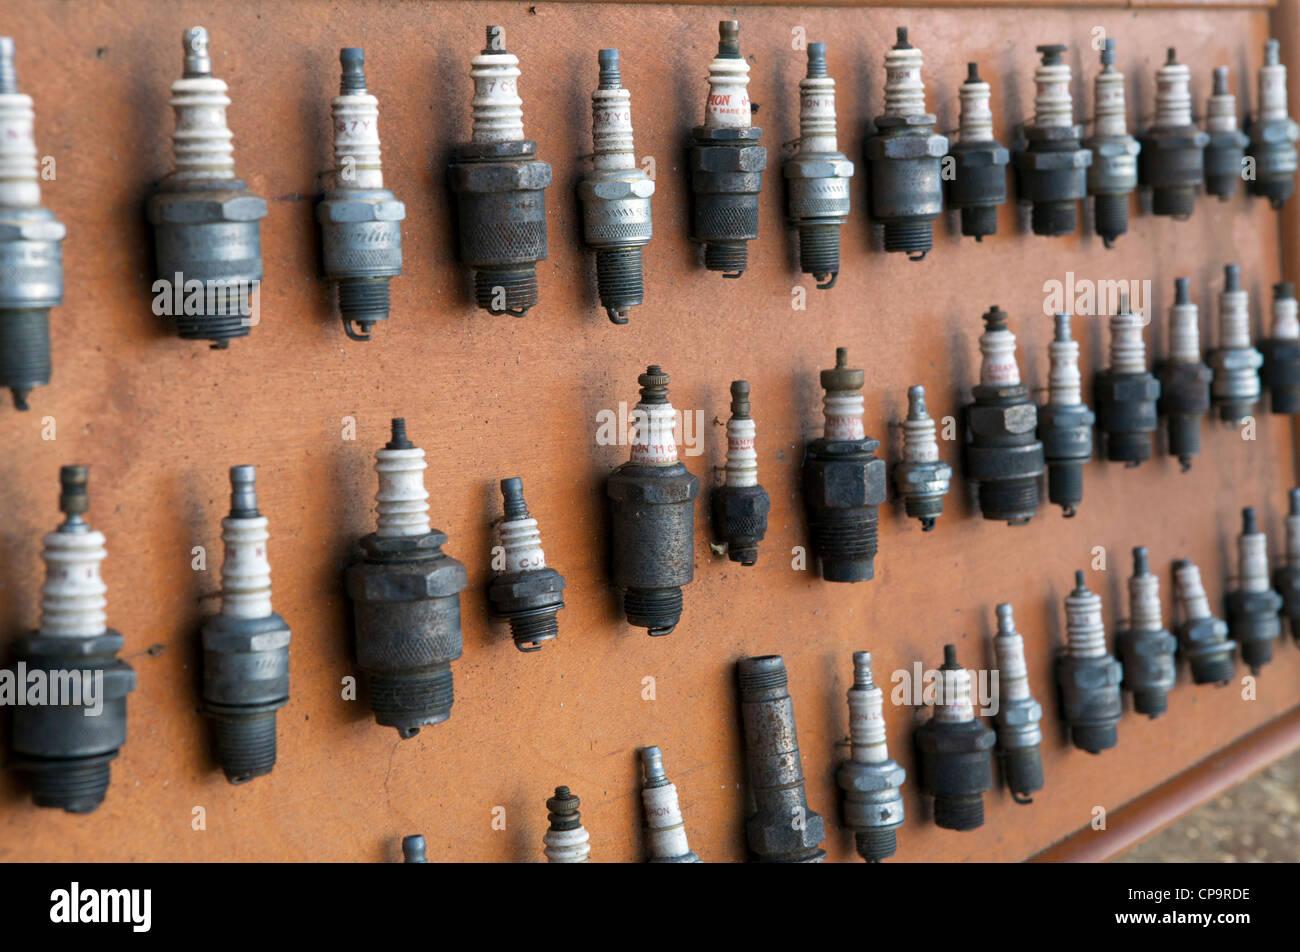 Vintage Spark Plugs Stock Photos & Vintage Spark Plugs Stock ... on harley plug wires, vintage sportster plug wires, vintage ignition coil, 426 hemi plug wires, vintage spark coil, vintage turn signals, vintage light bulbs, lightning bug plug wires, vintage ignition wires, vintage mirrors, vintage gauges,